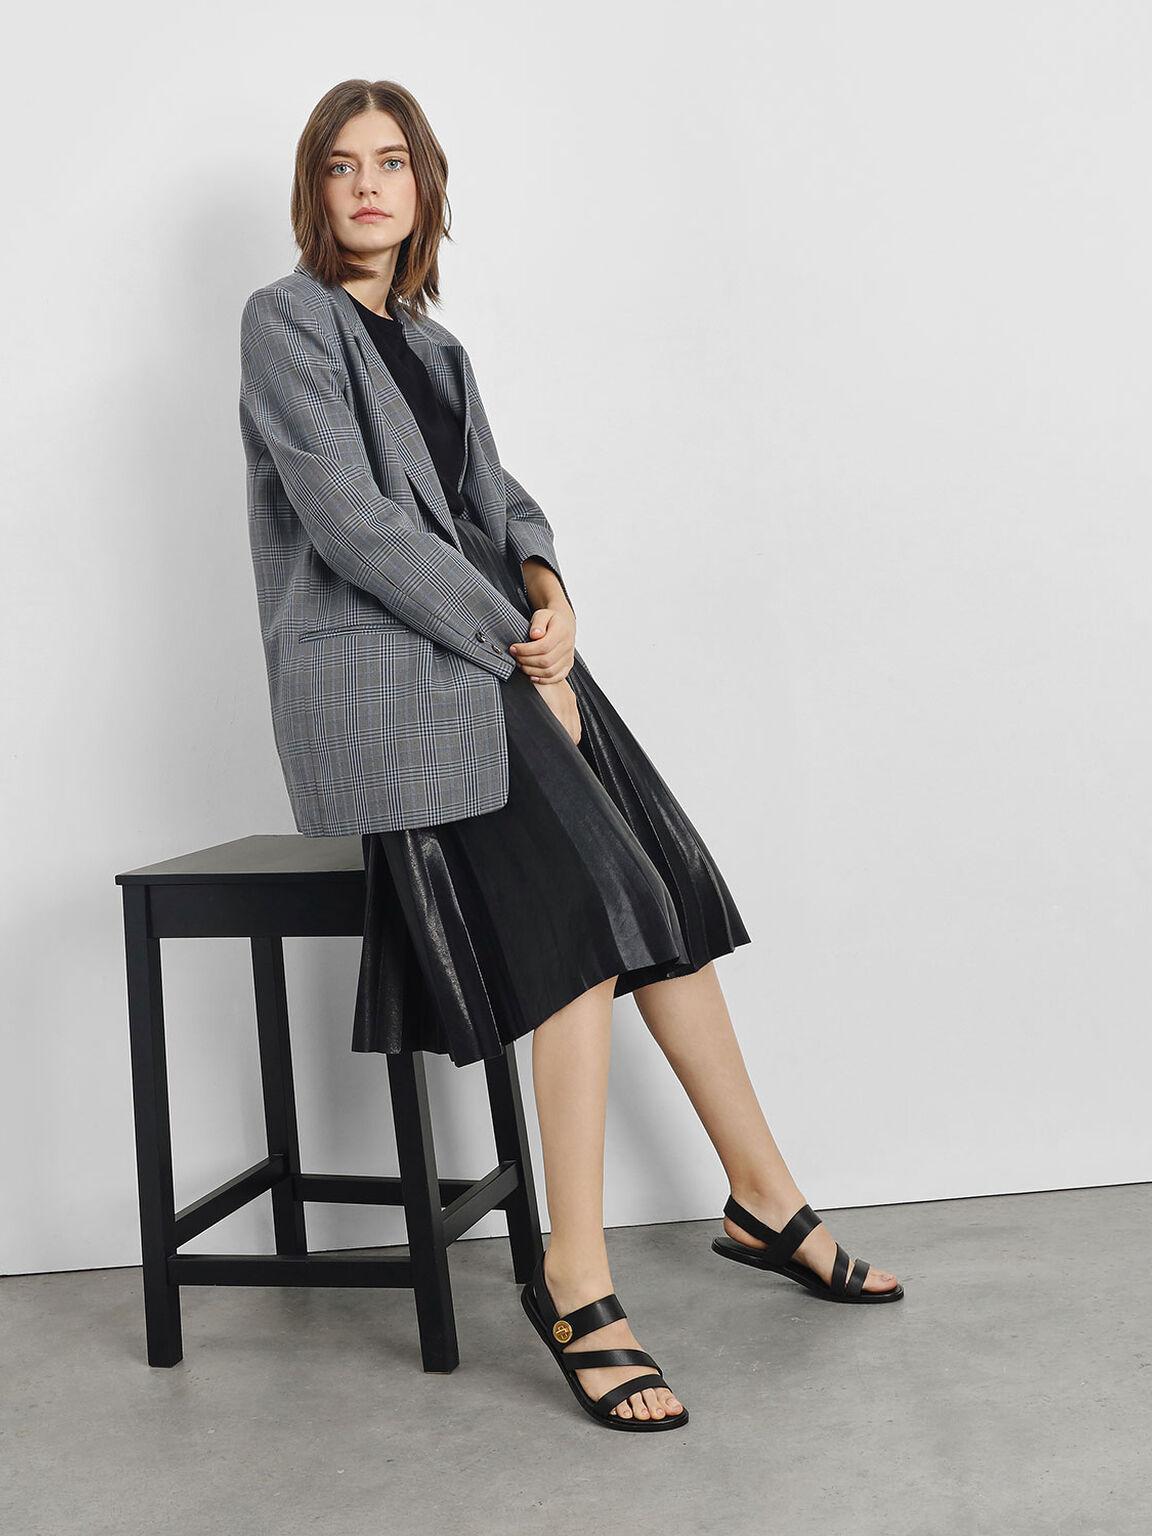 Asymmetrical Strappy Sandals, Black, hi-res